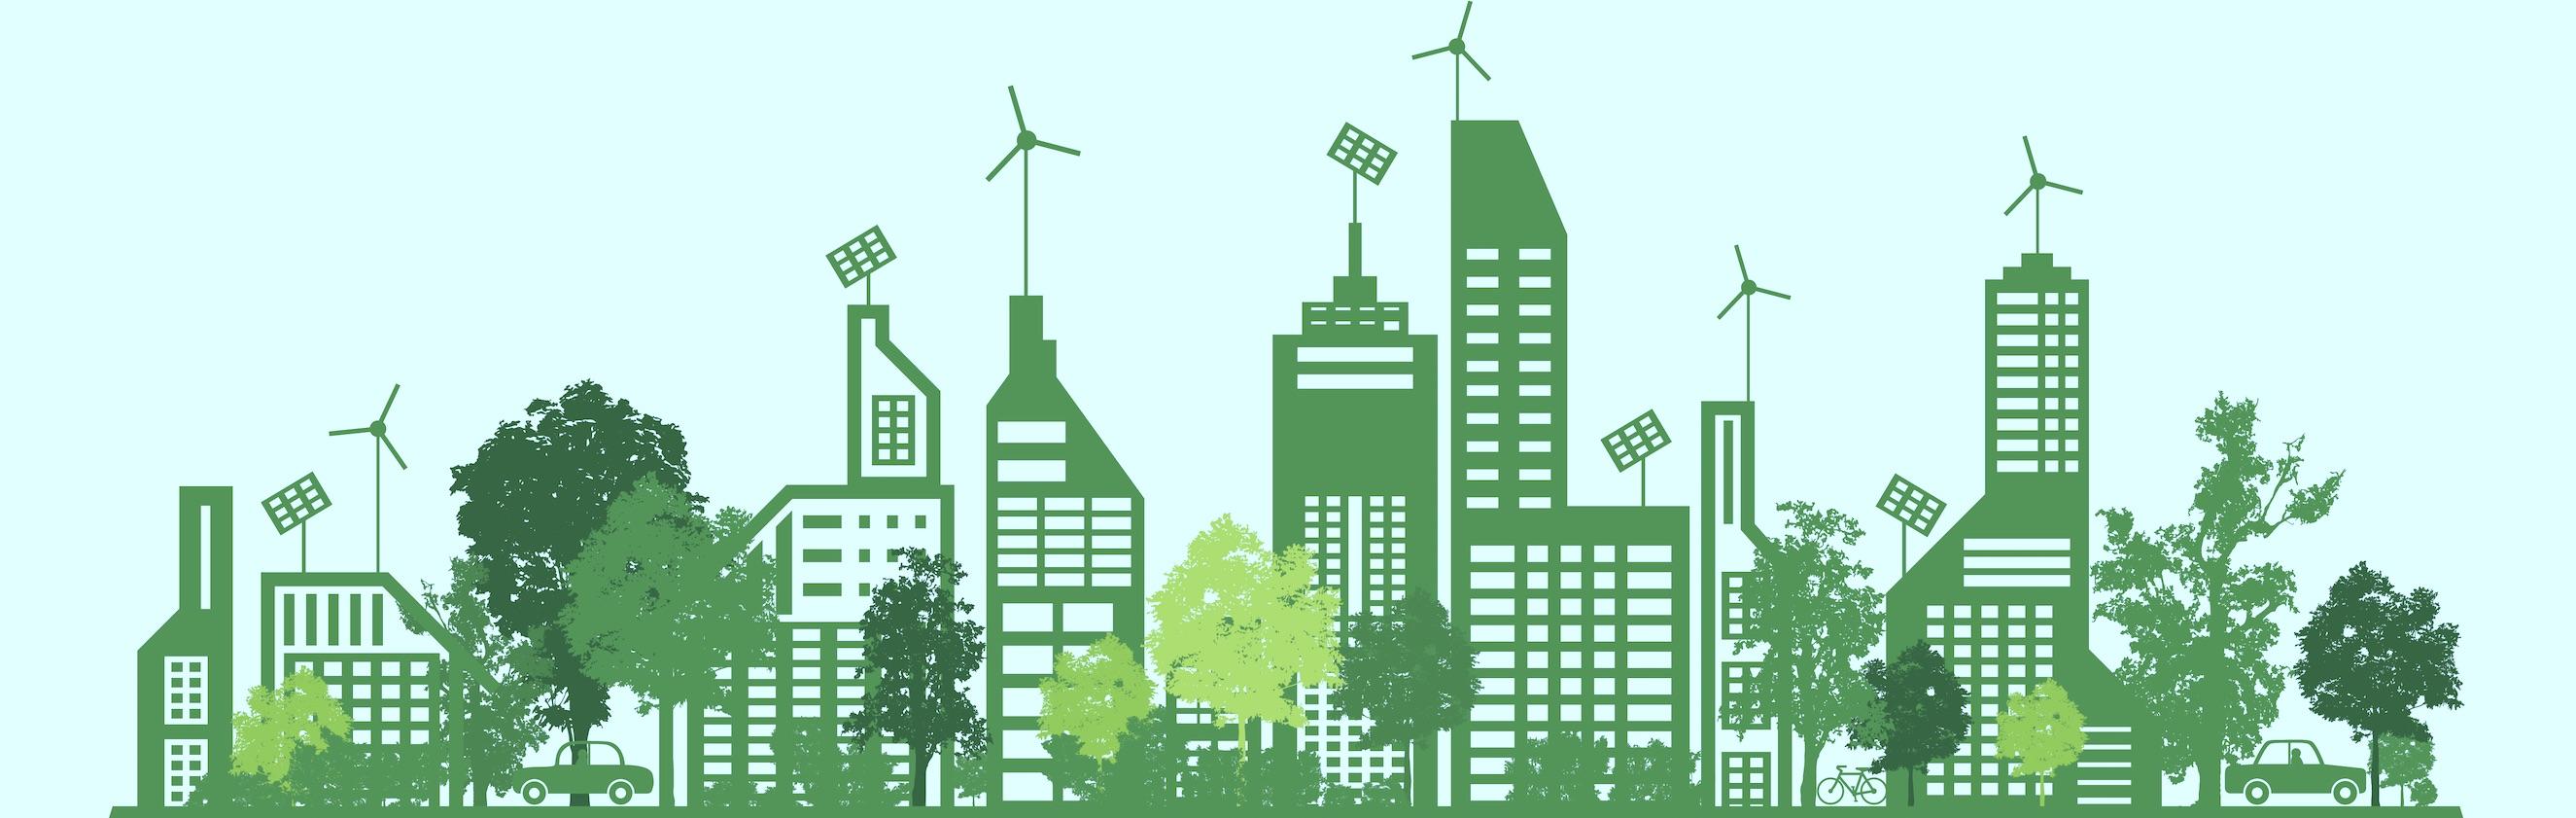 Accelerating Innovation Integration<br>in the Green Industrial Revolution